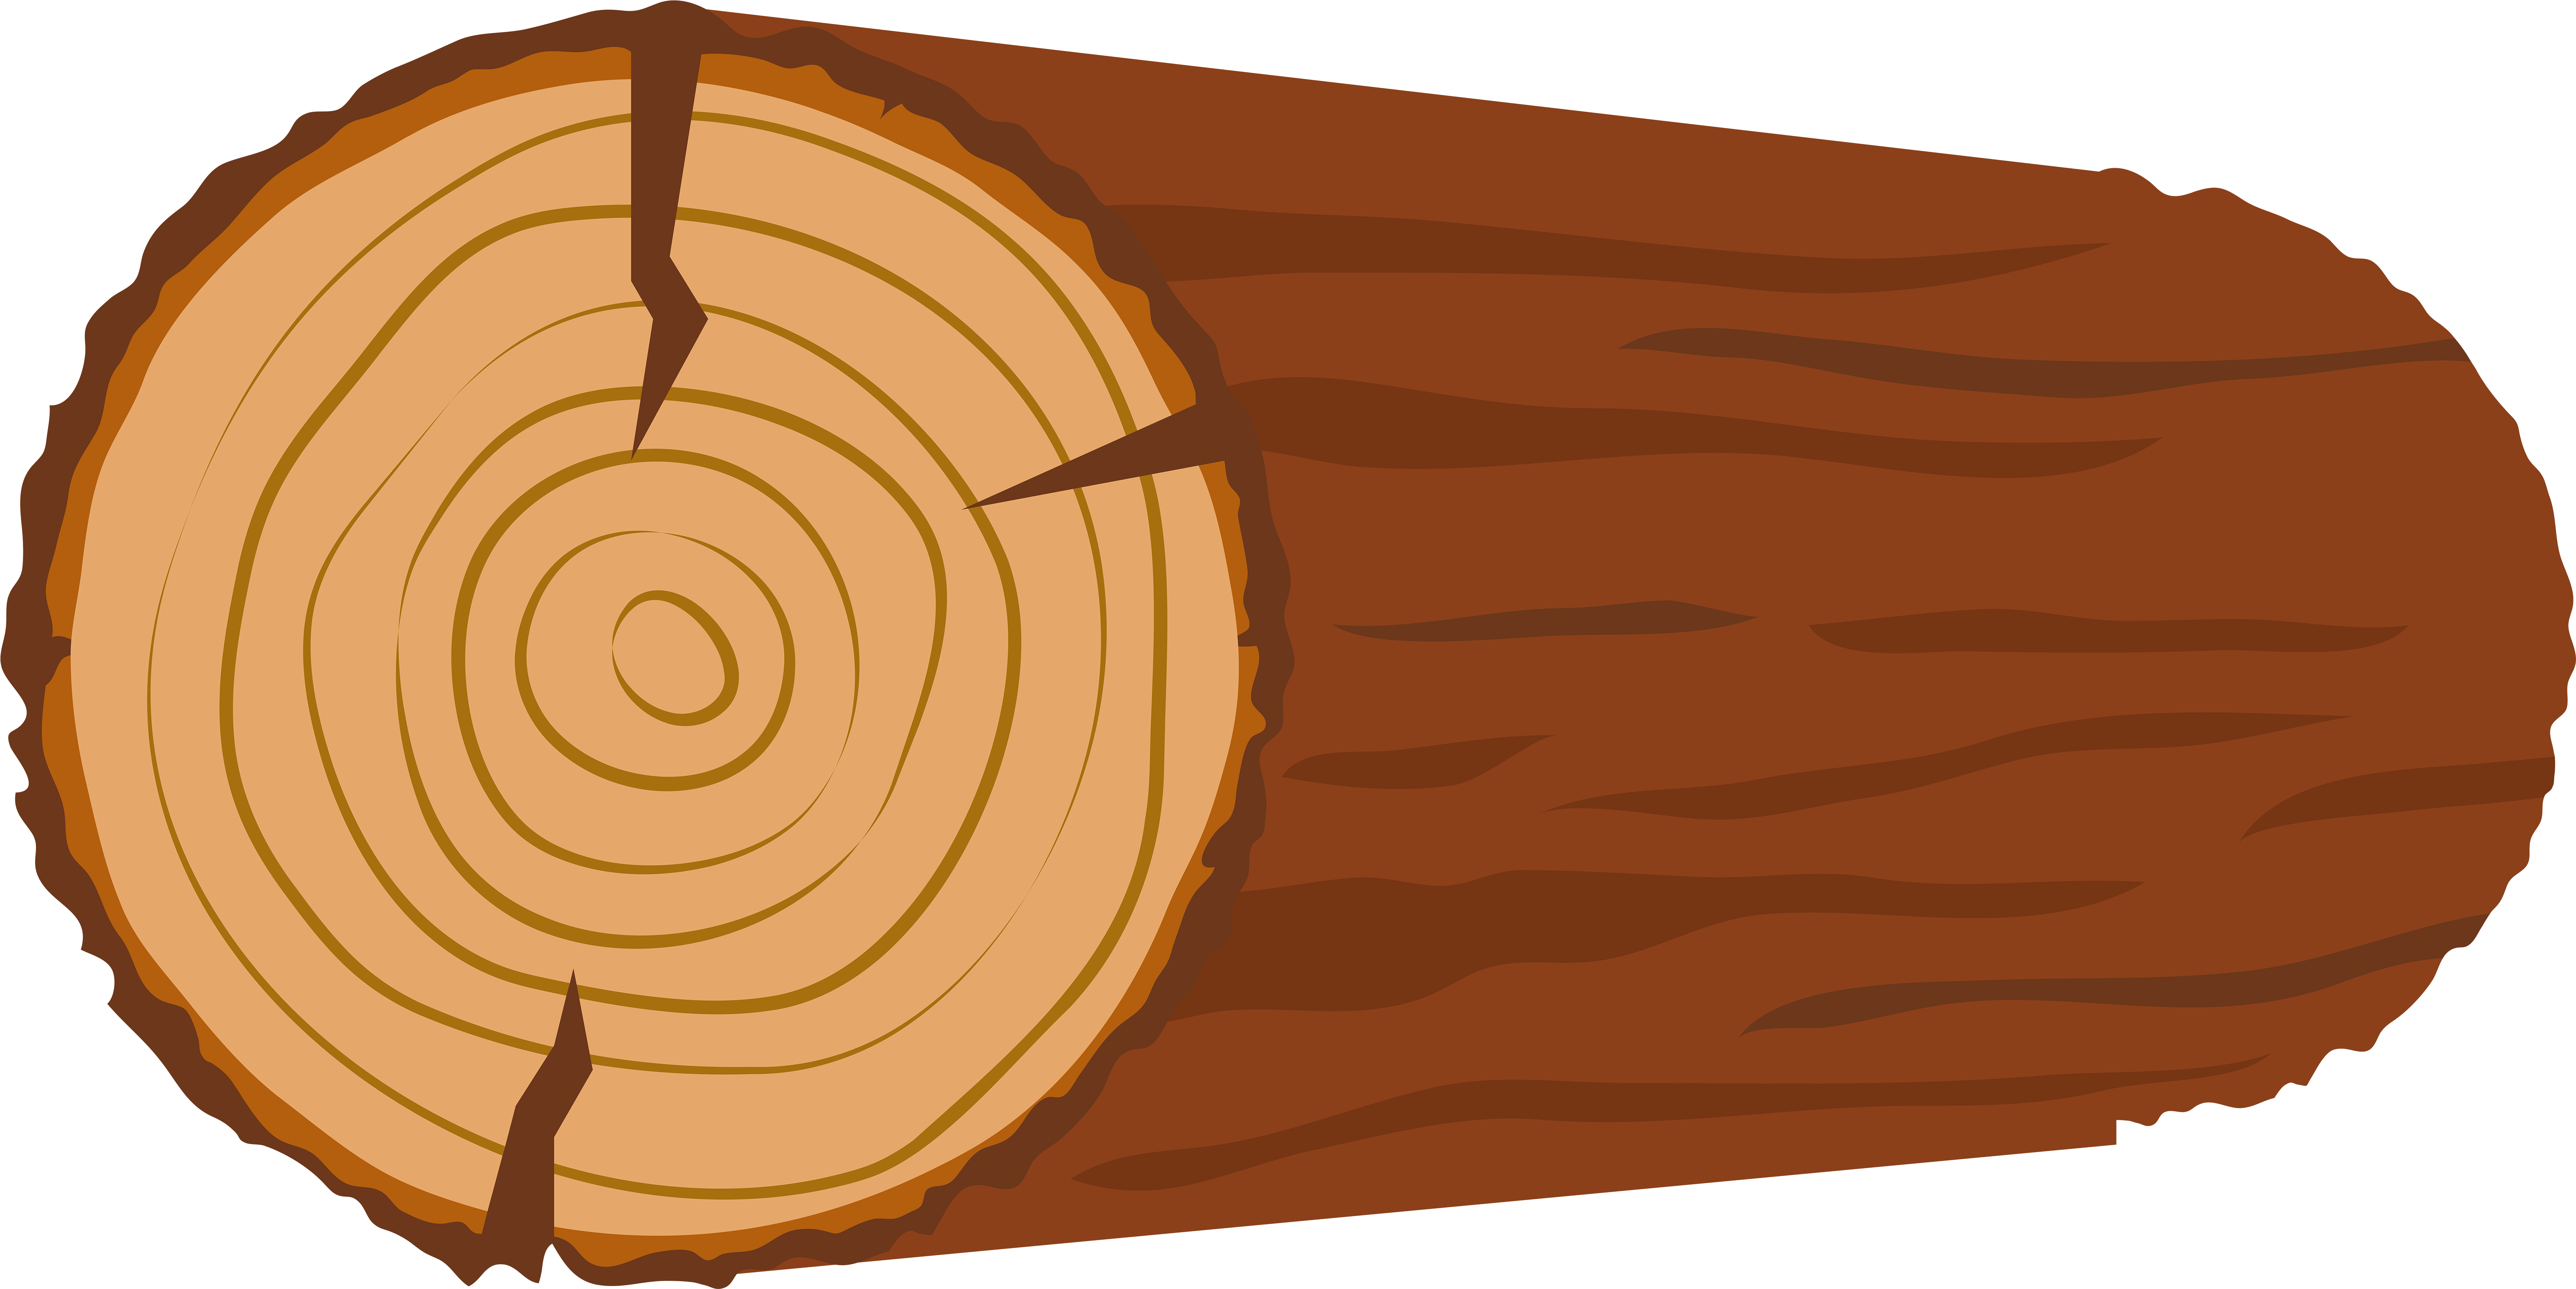 Logs clipart vector transparent Banner Download Logs Clipart Piece Wood - Log Clipart ... vector transparent